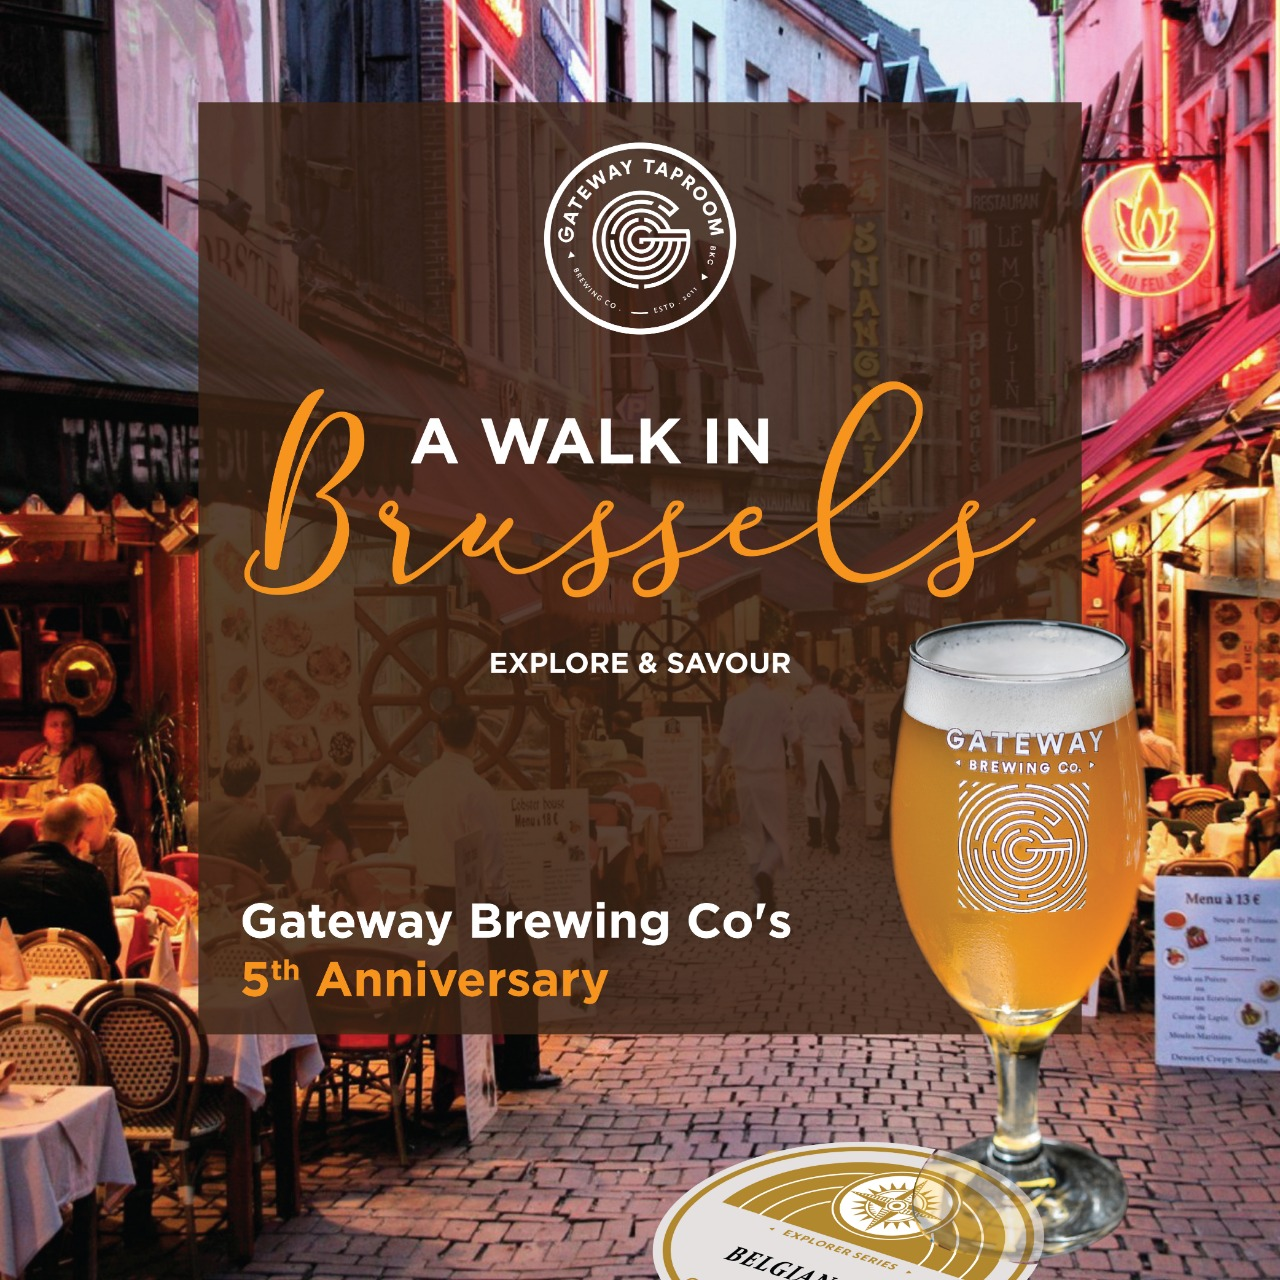 A Walk in Brussels